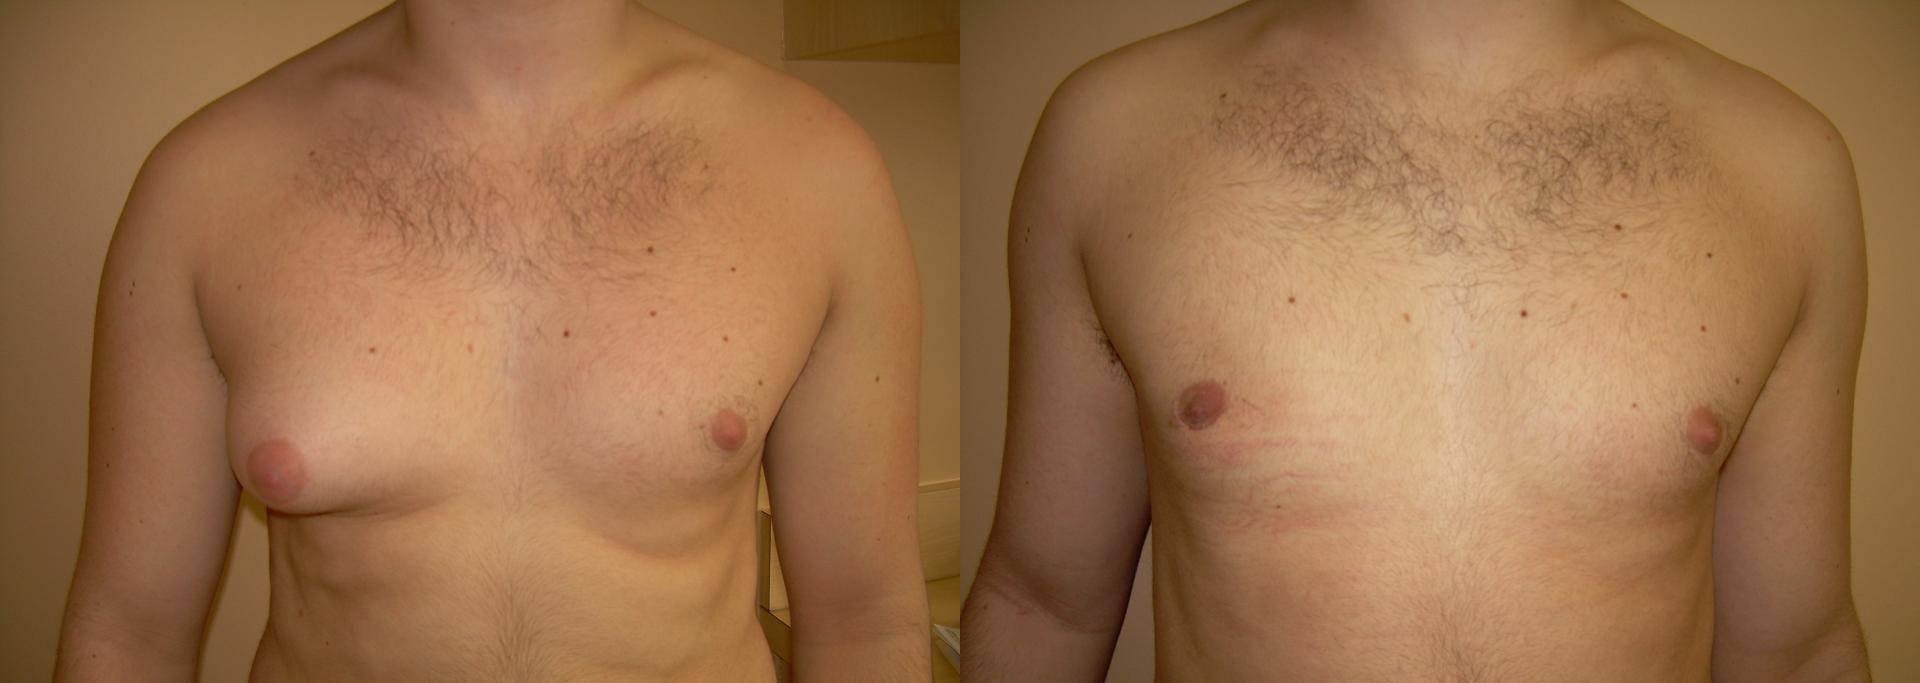 Причины гинекомастии у мужчин — диагностика и лечение гинекомастии